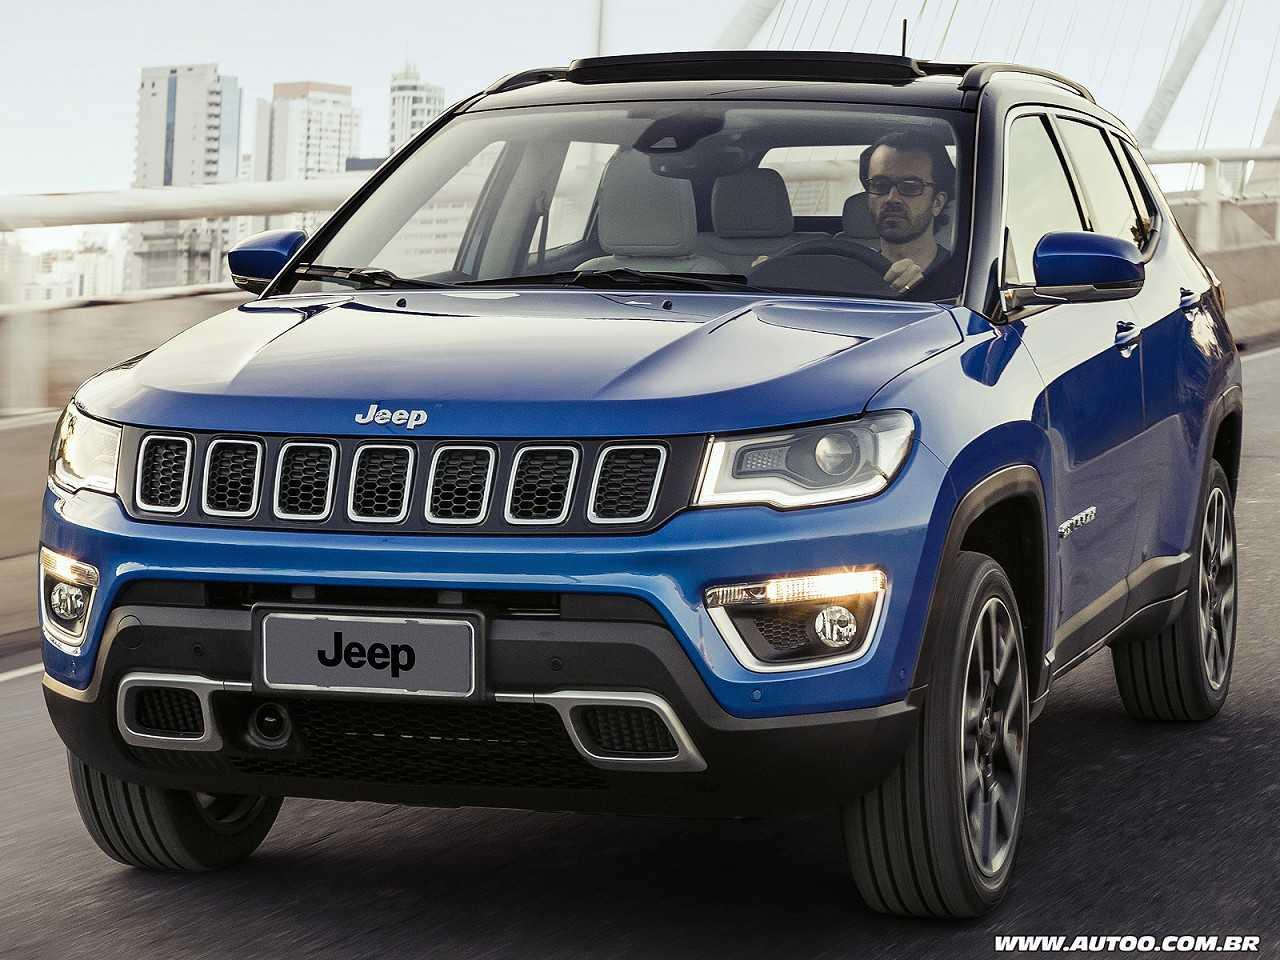 JeepCompass 2018 - ângulo frontal